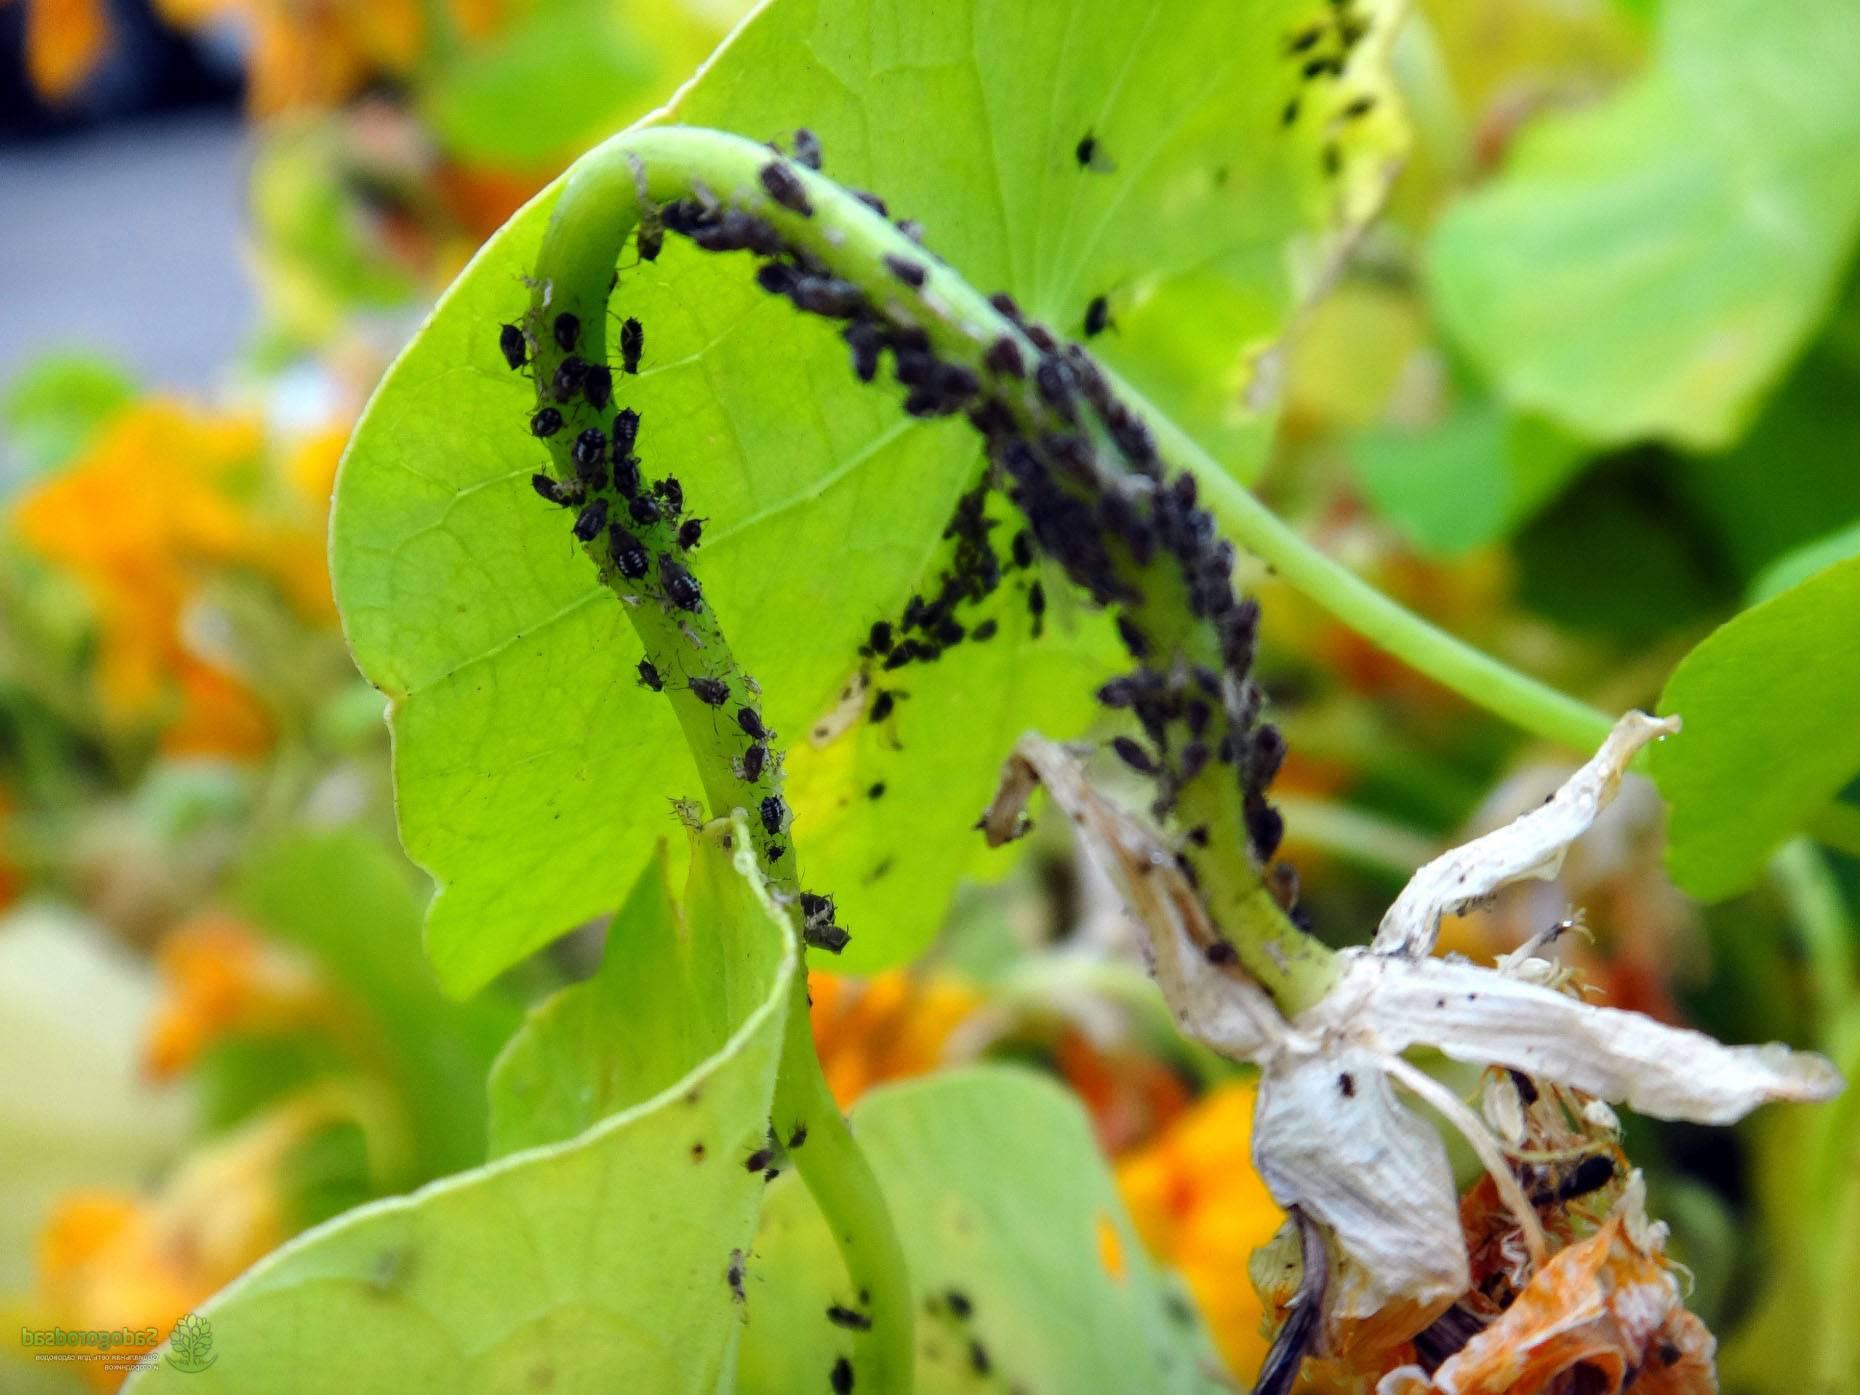 Как избавиться от тли на огурцах во время плодоношения